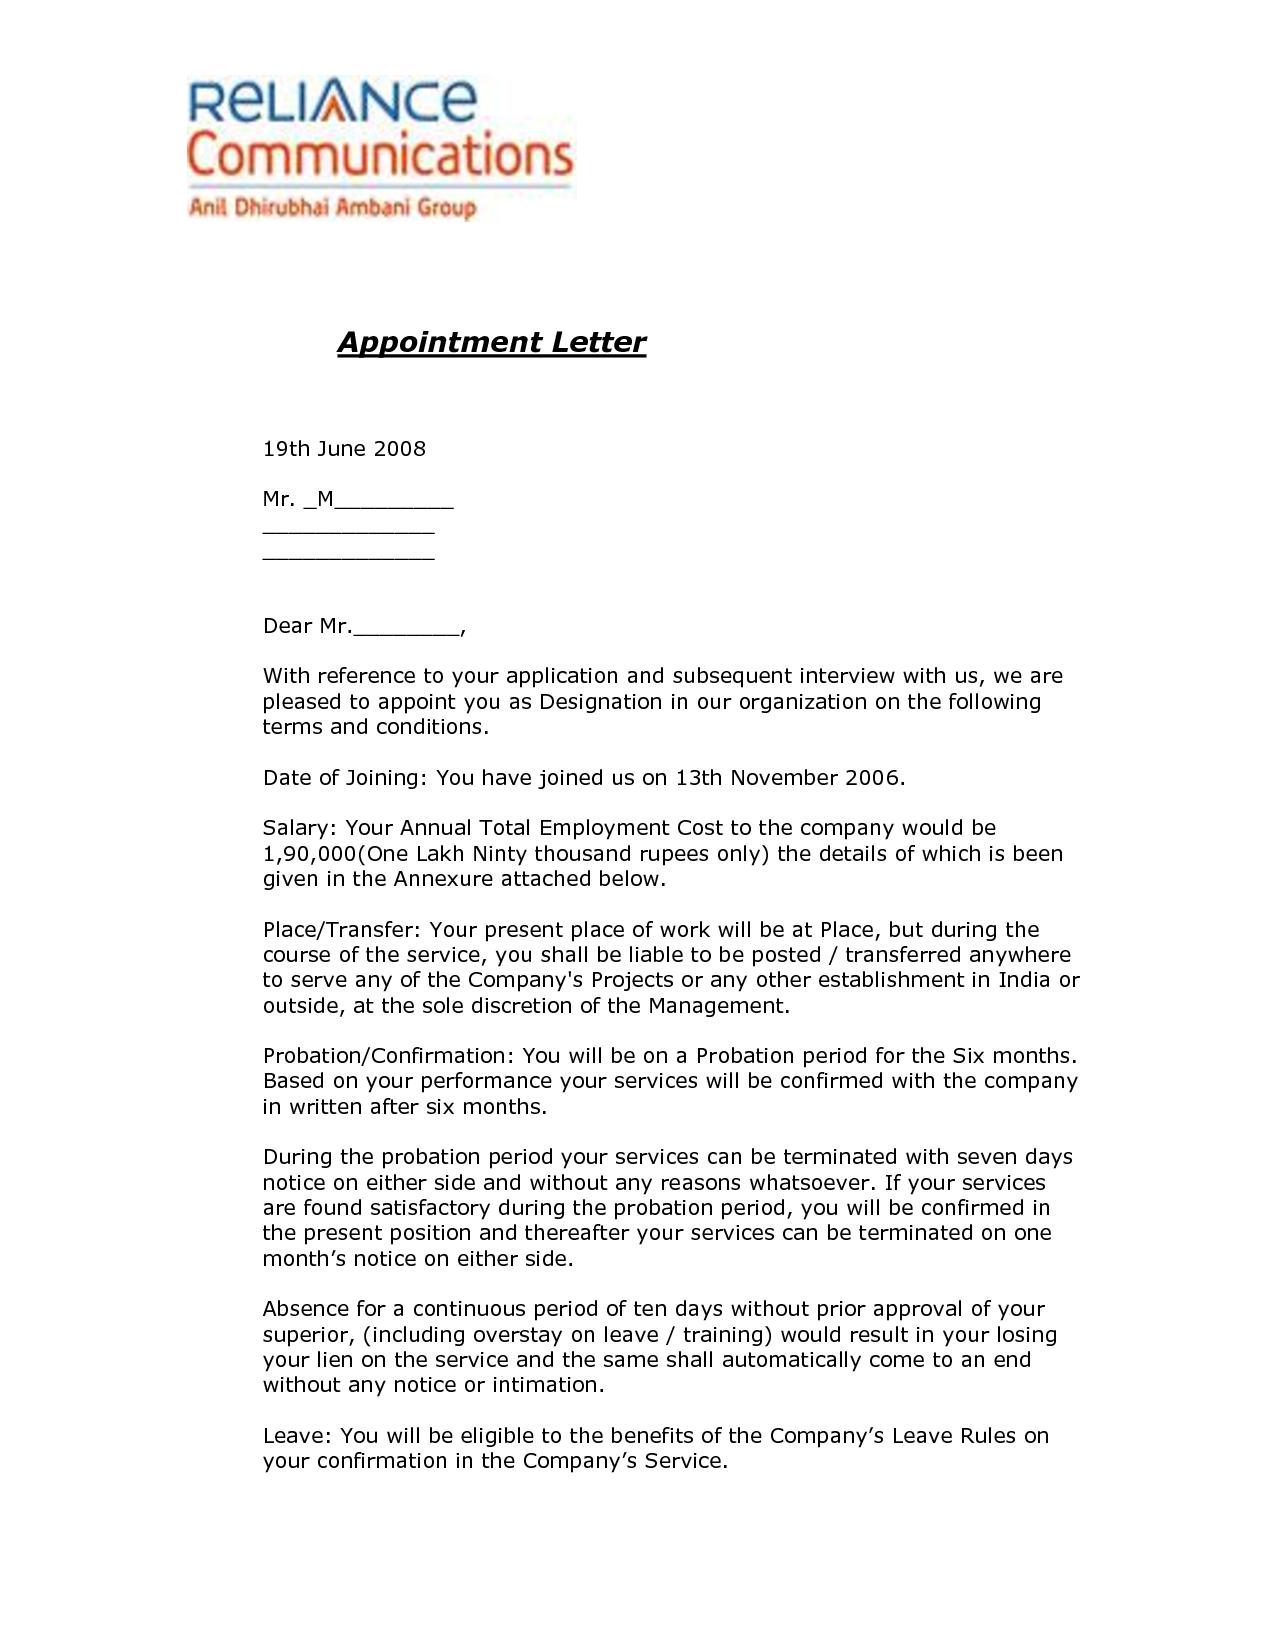 Real Estate Offer Letter Template - Joining Letter format for Offer Letter format